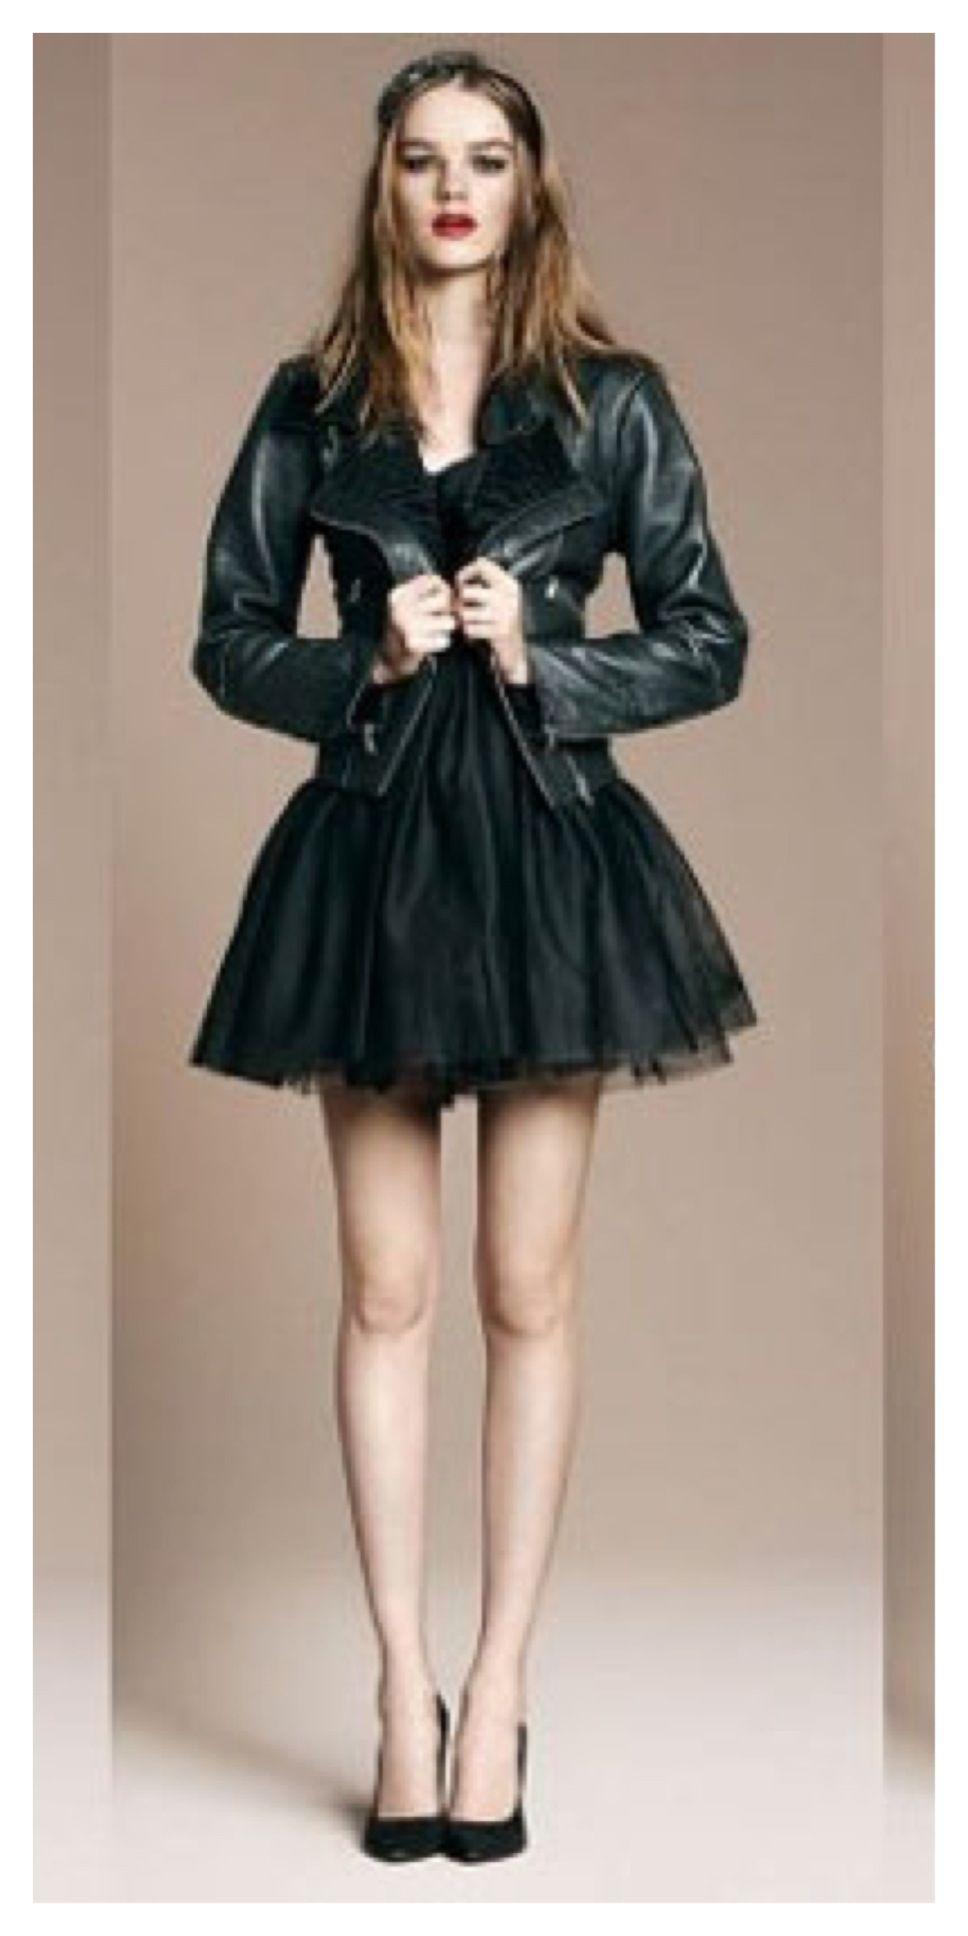 leather prom dress Fashion, Dresses, Leather jacket dress